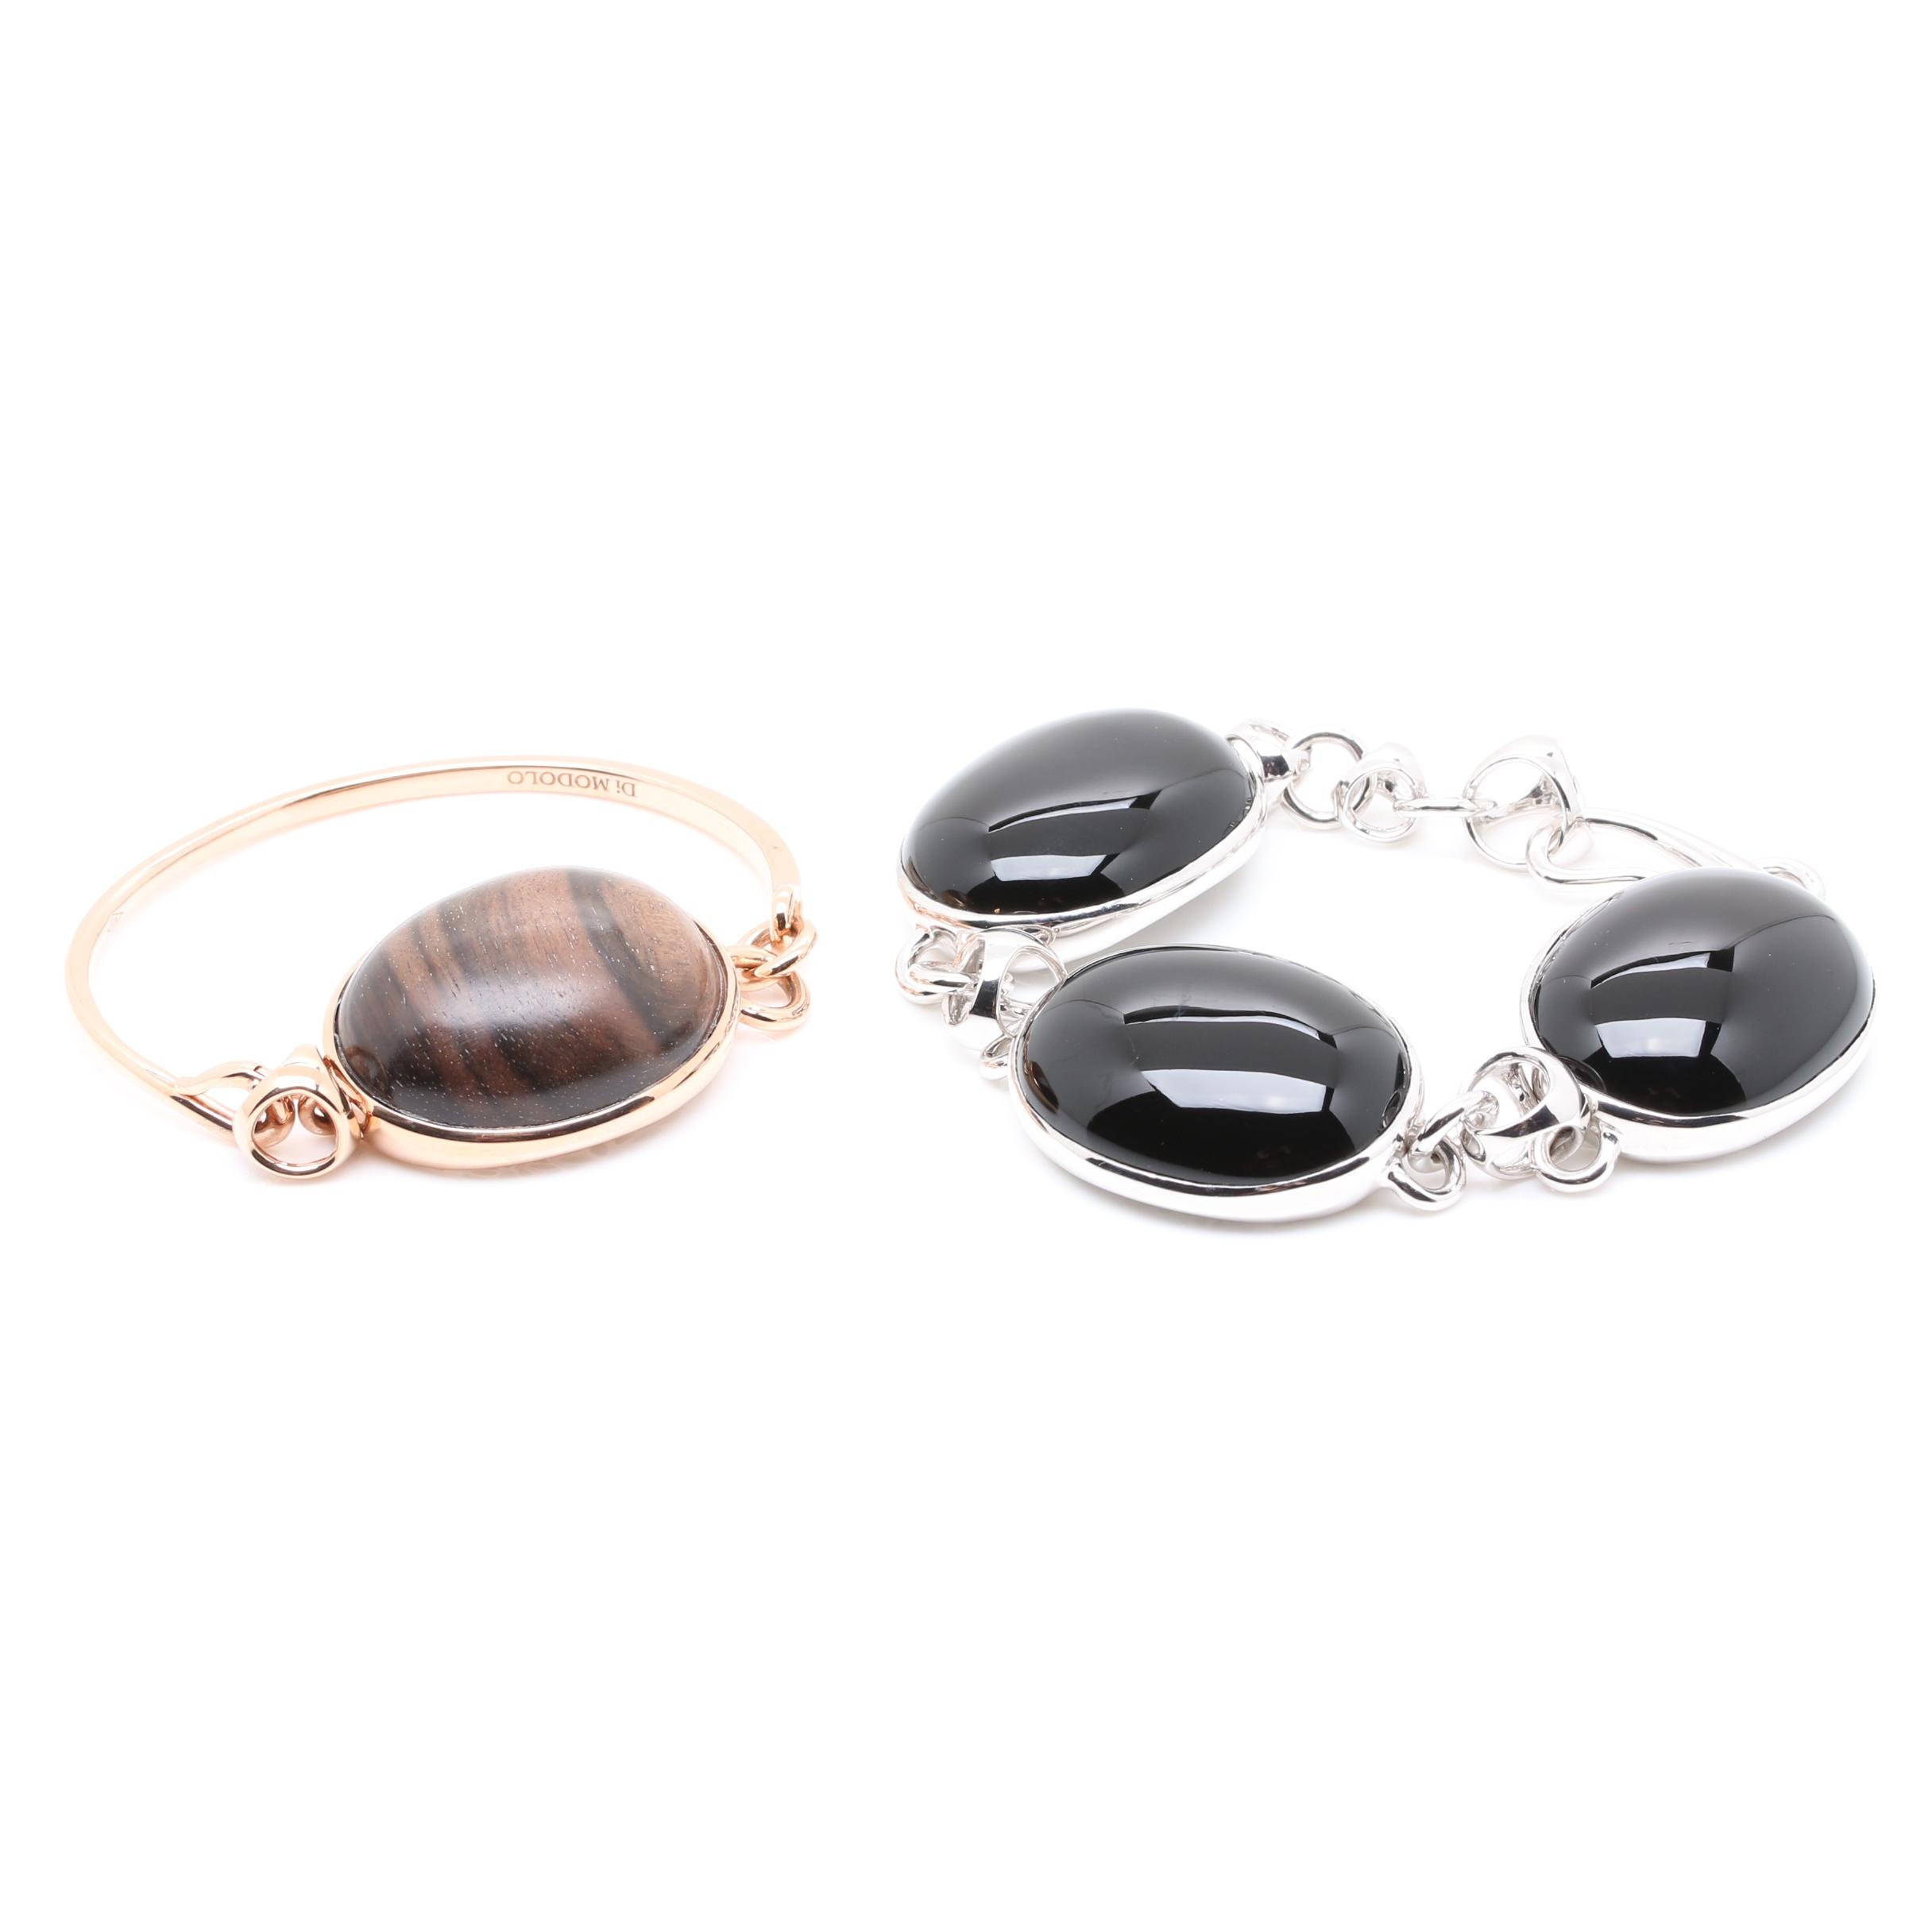 Di Modolo Sterling Silver Black Onyx and Wood Bracelets